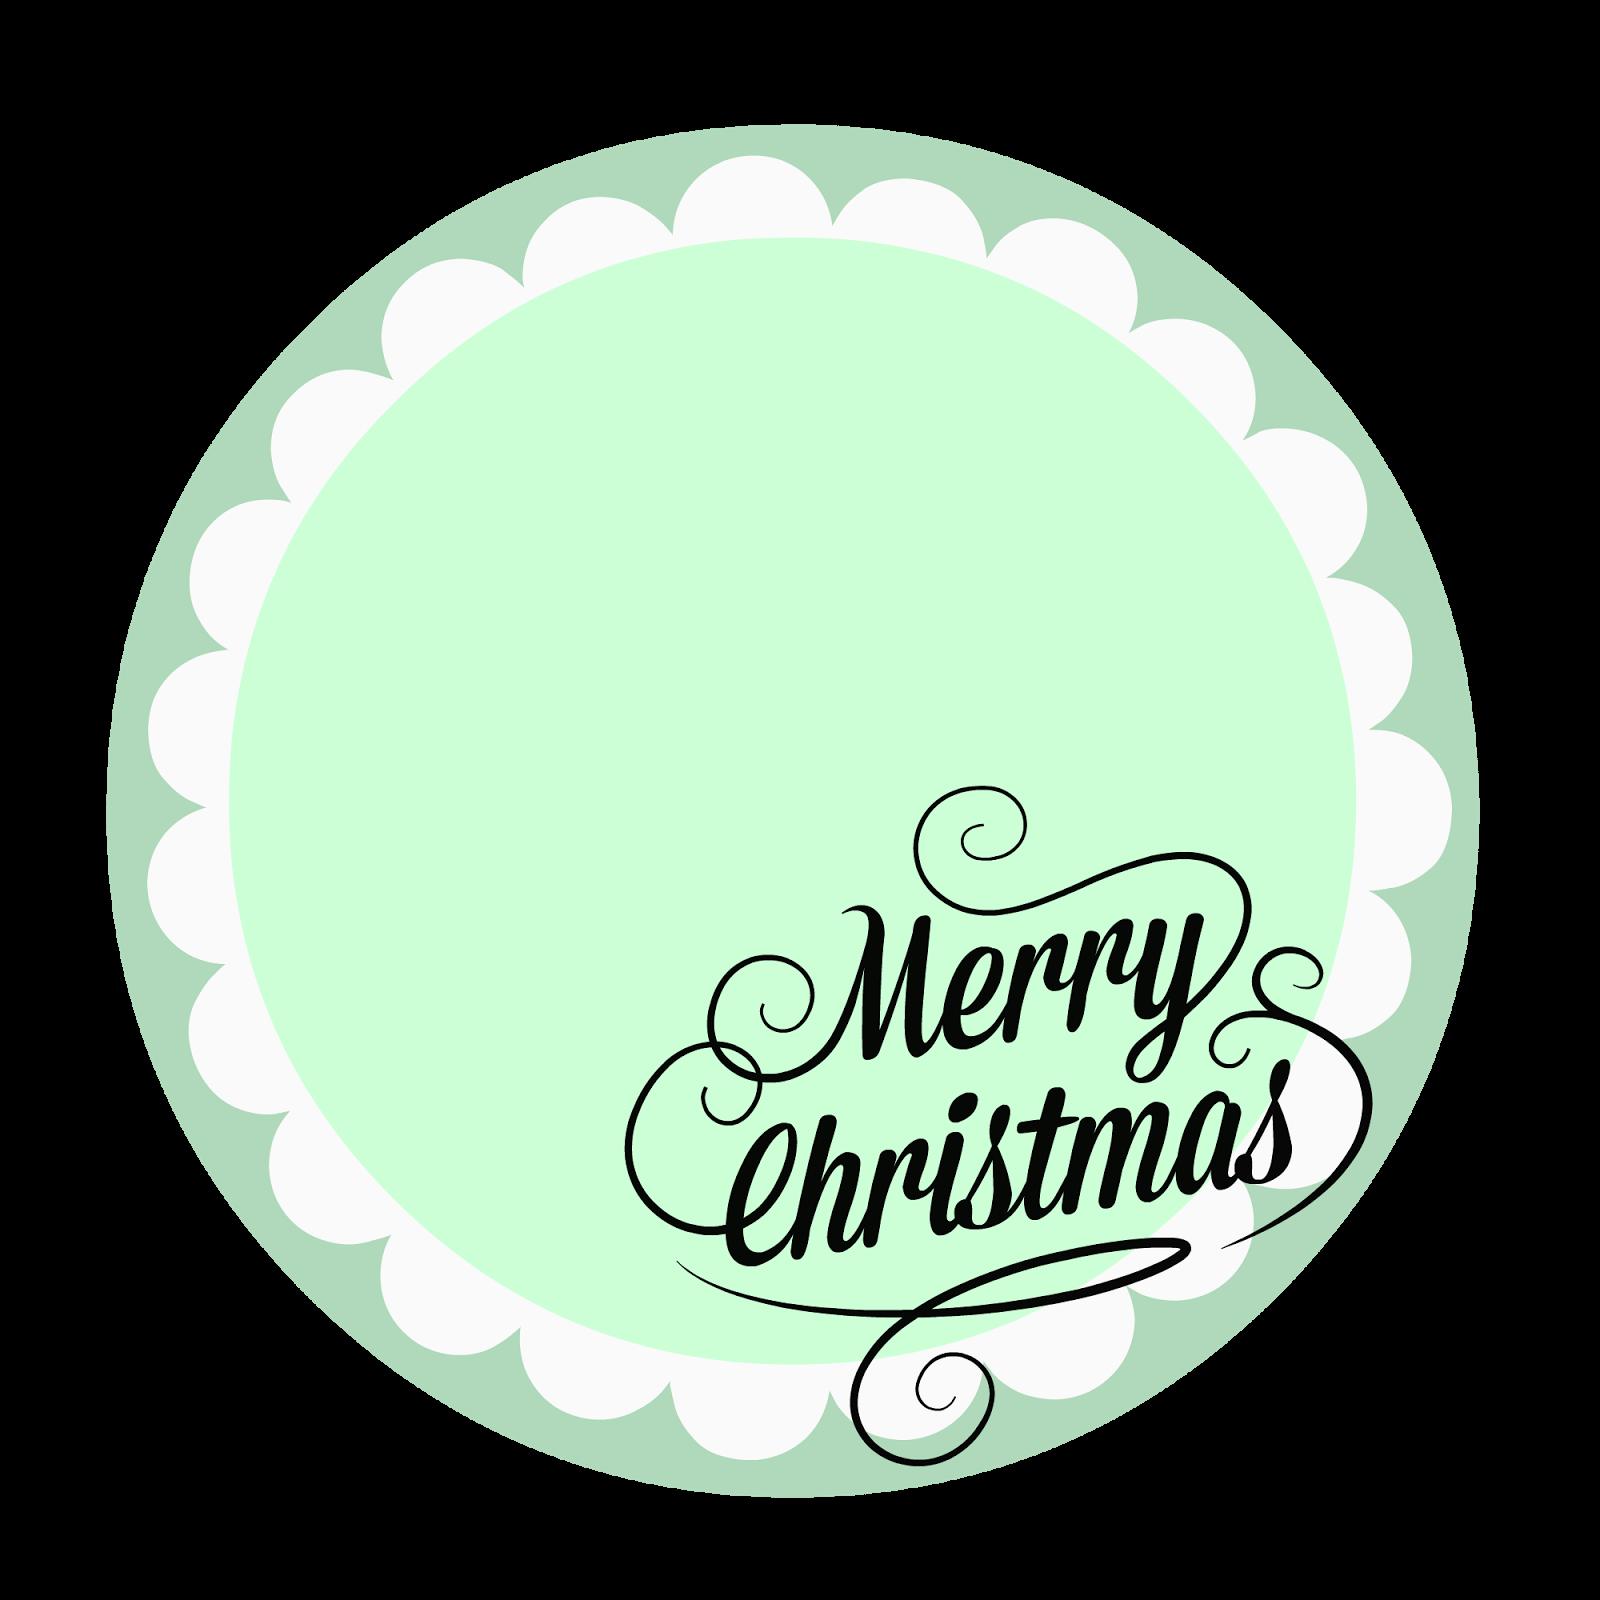 etiqueta de navidad